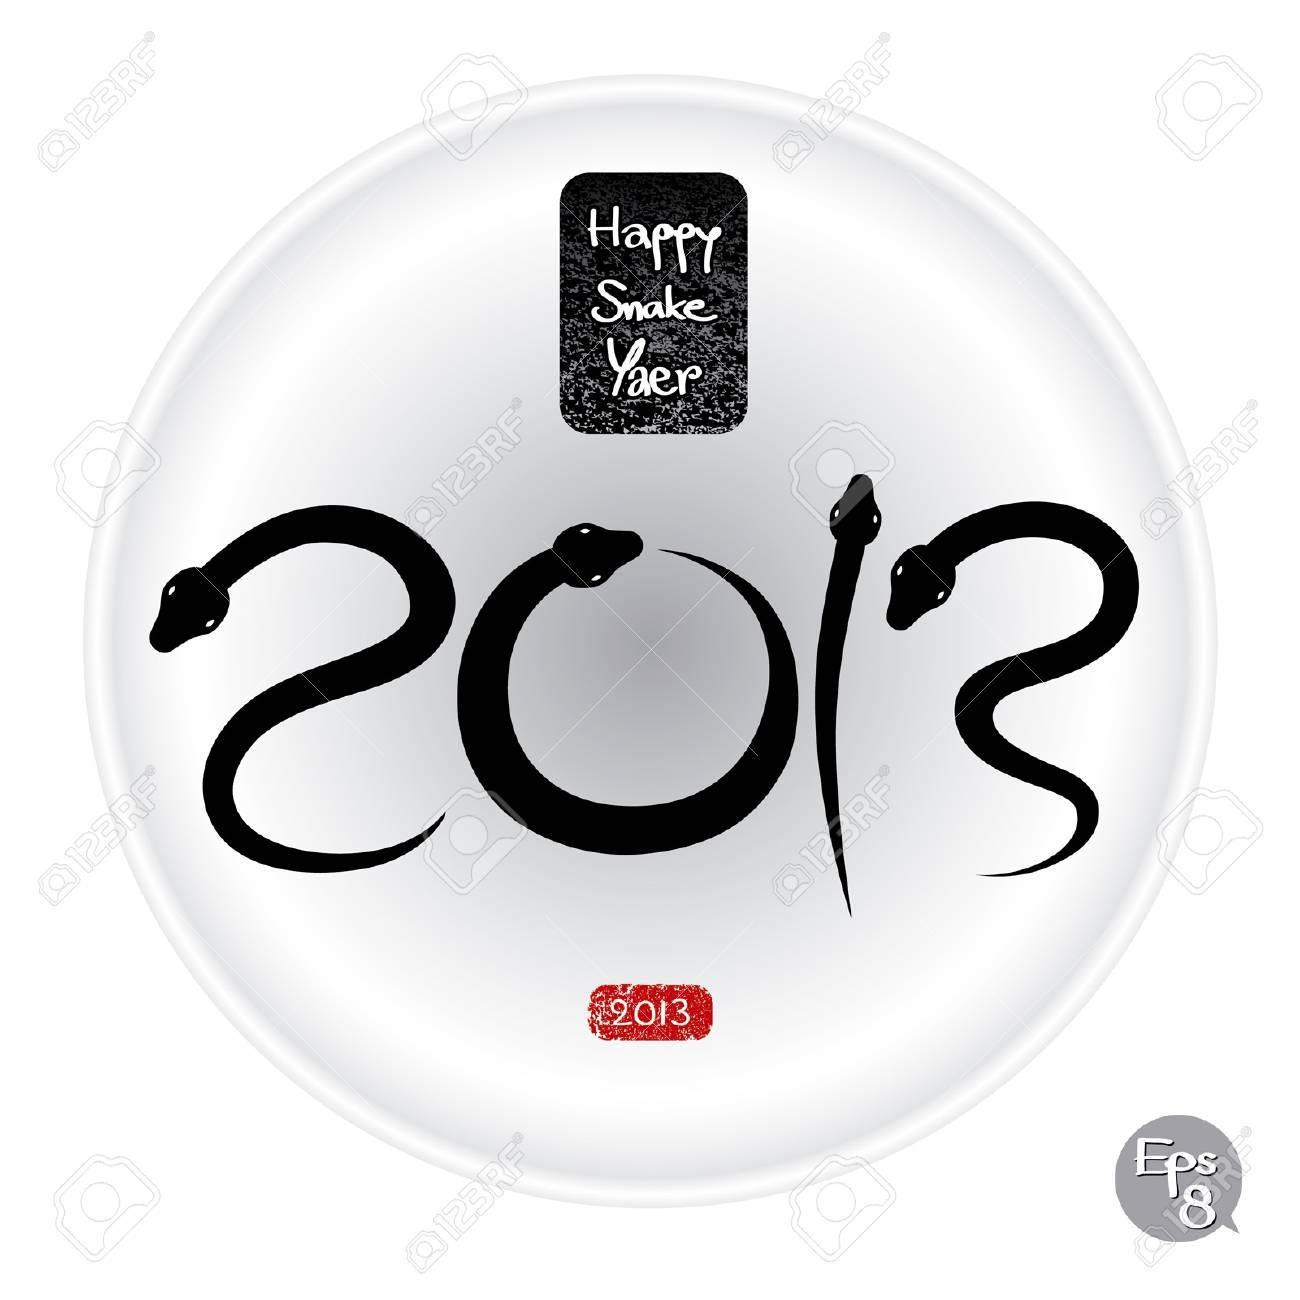 happy snake year 2013 - 15528496